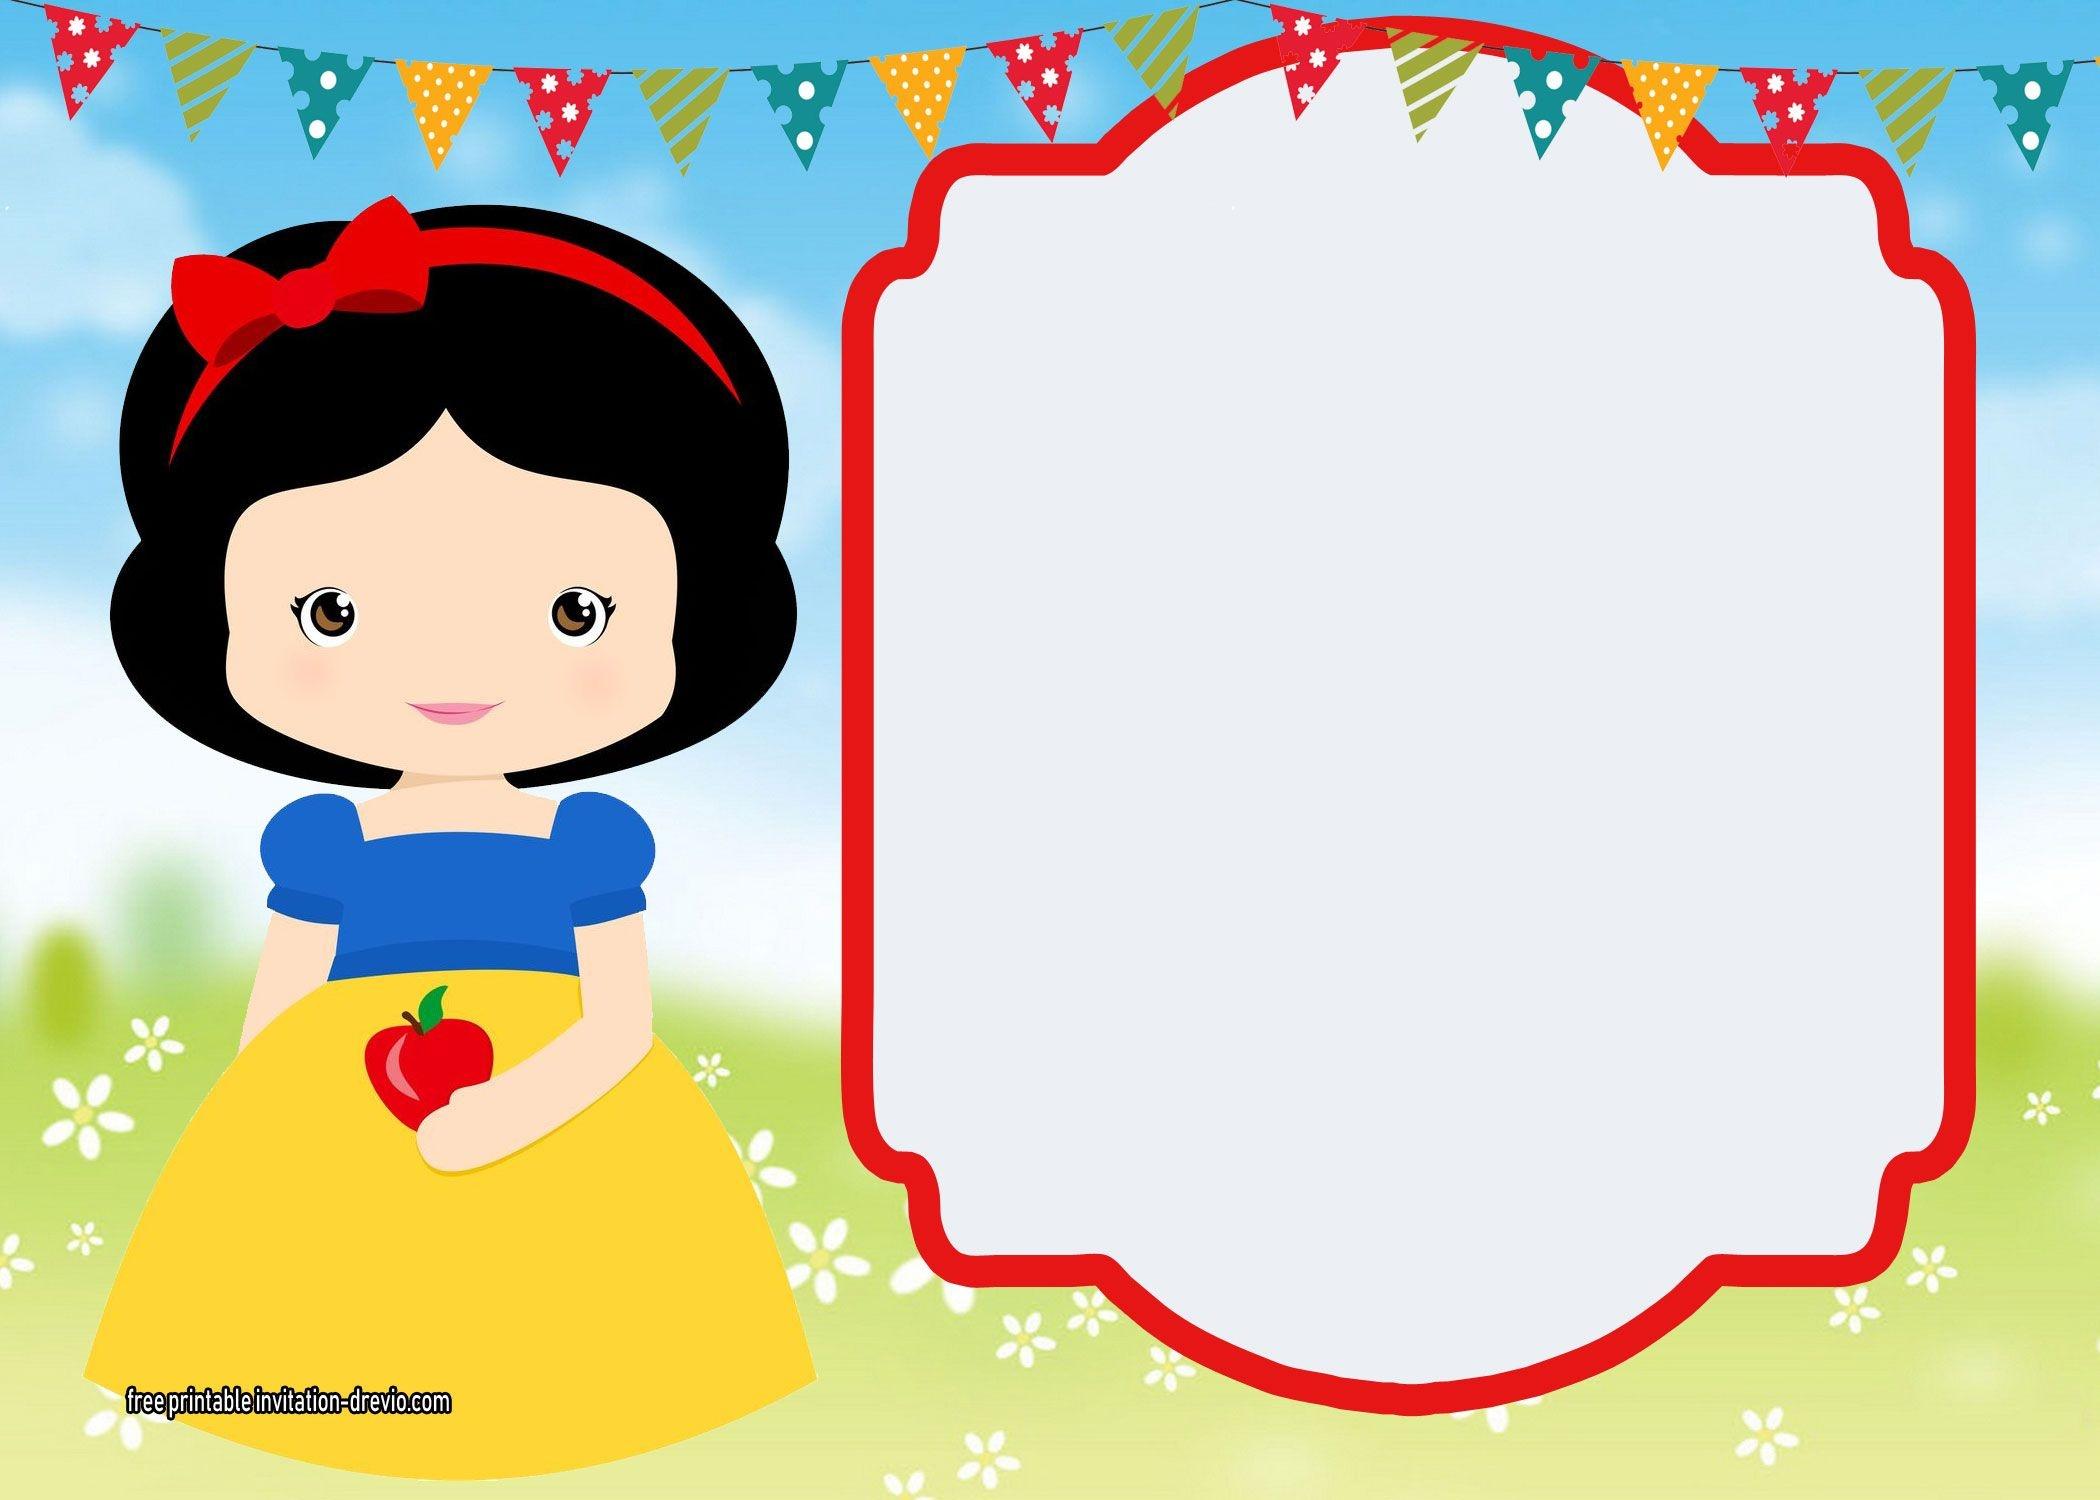 Free Printable Snow White Invitations - Complete | Free Printable - Snow White Invitations Free Printable